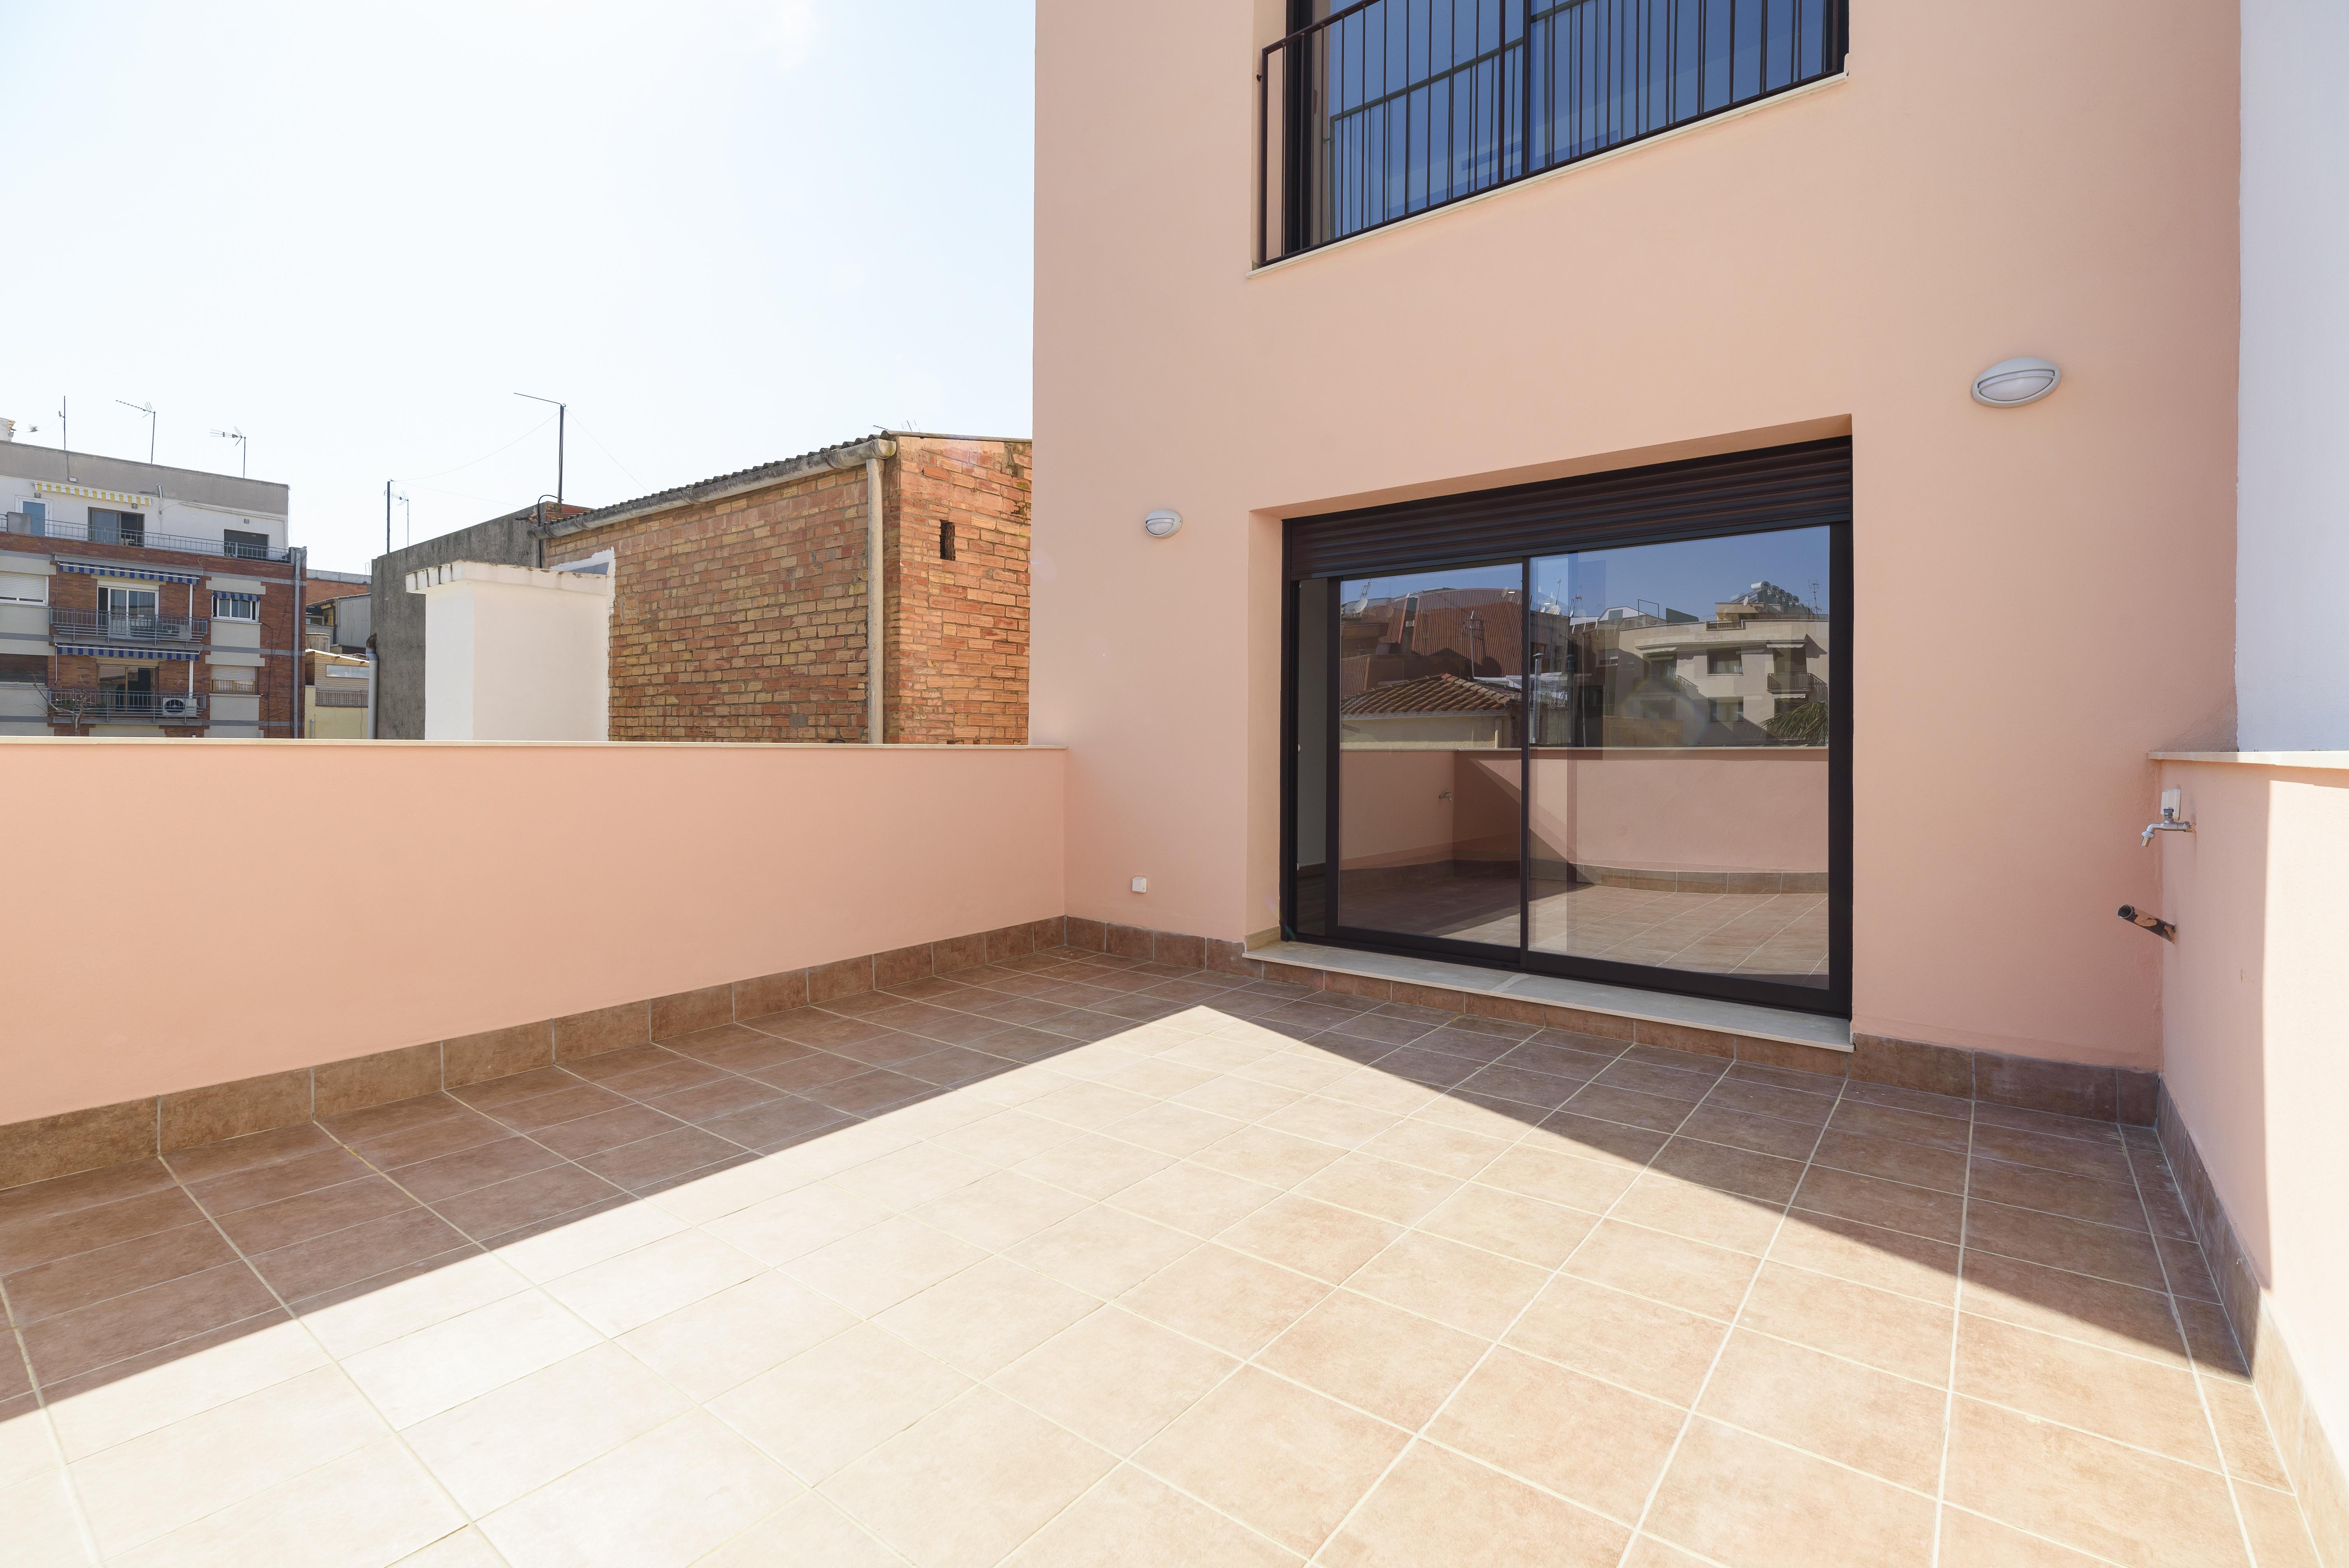 Piso  Calle catalunya. Obra nueva con terraza 22m²